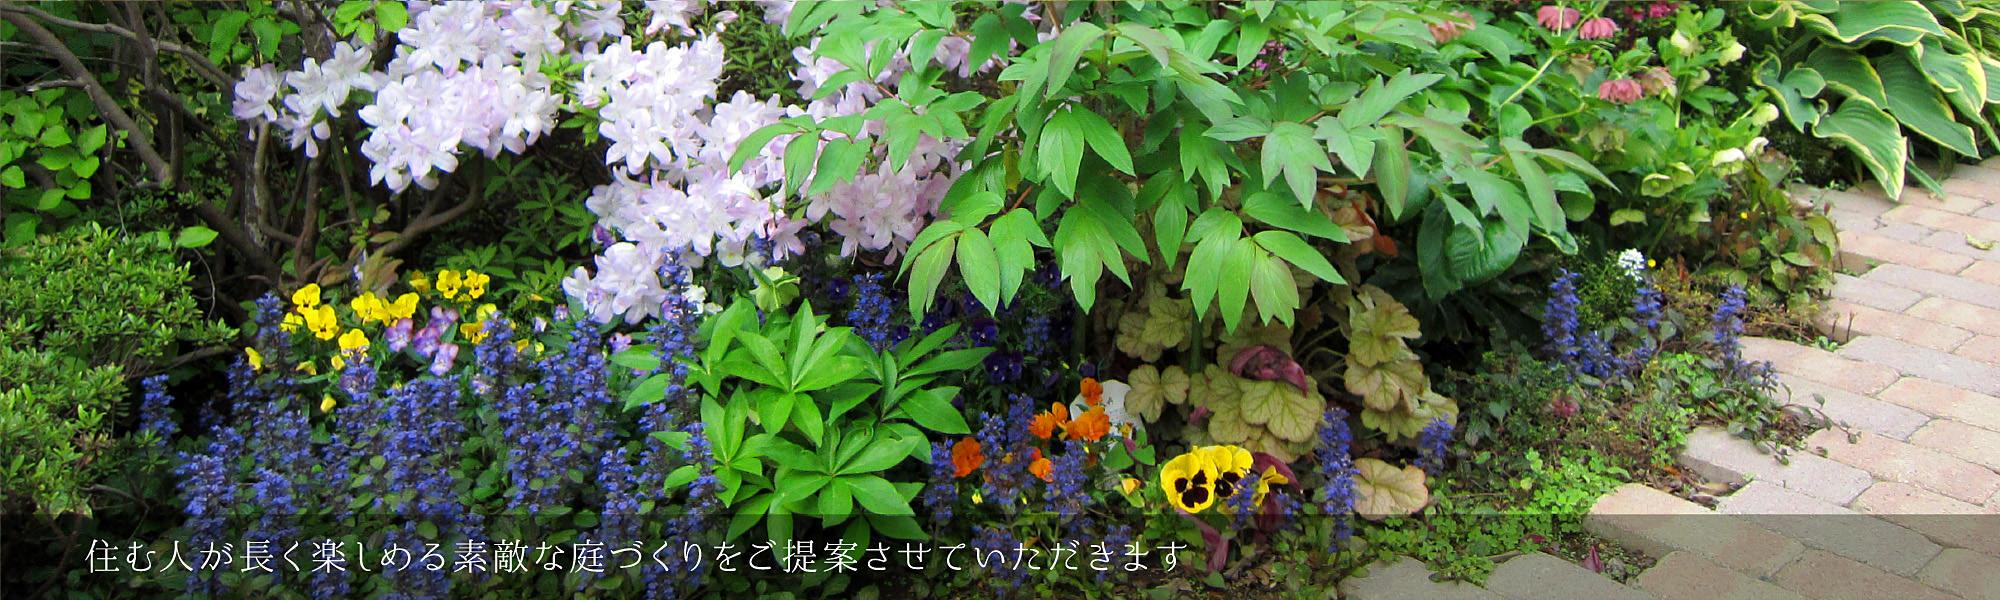 <a href='http://yakigaya-zouen.com/archives/657'></a>